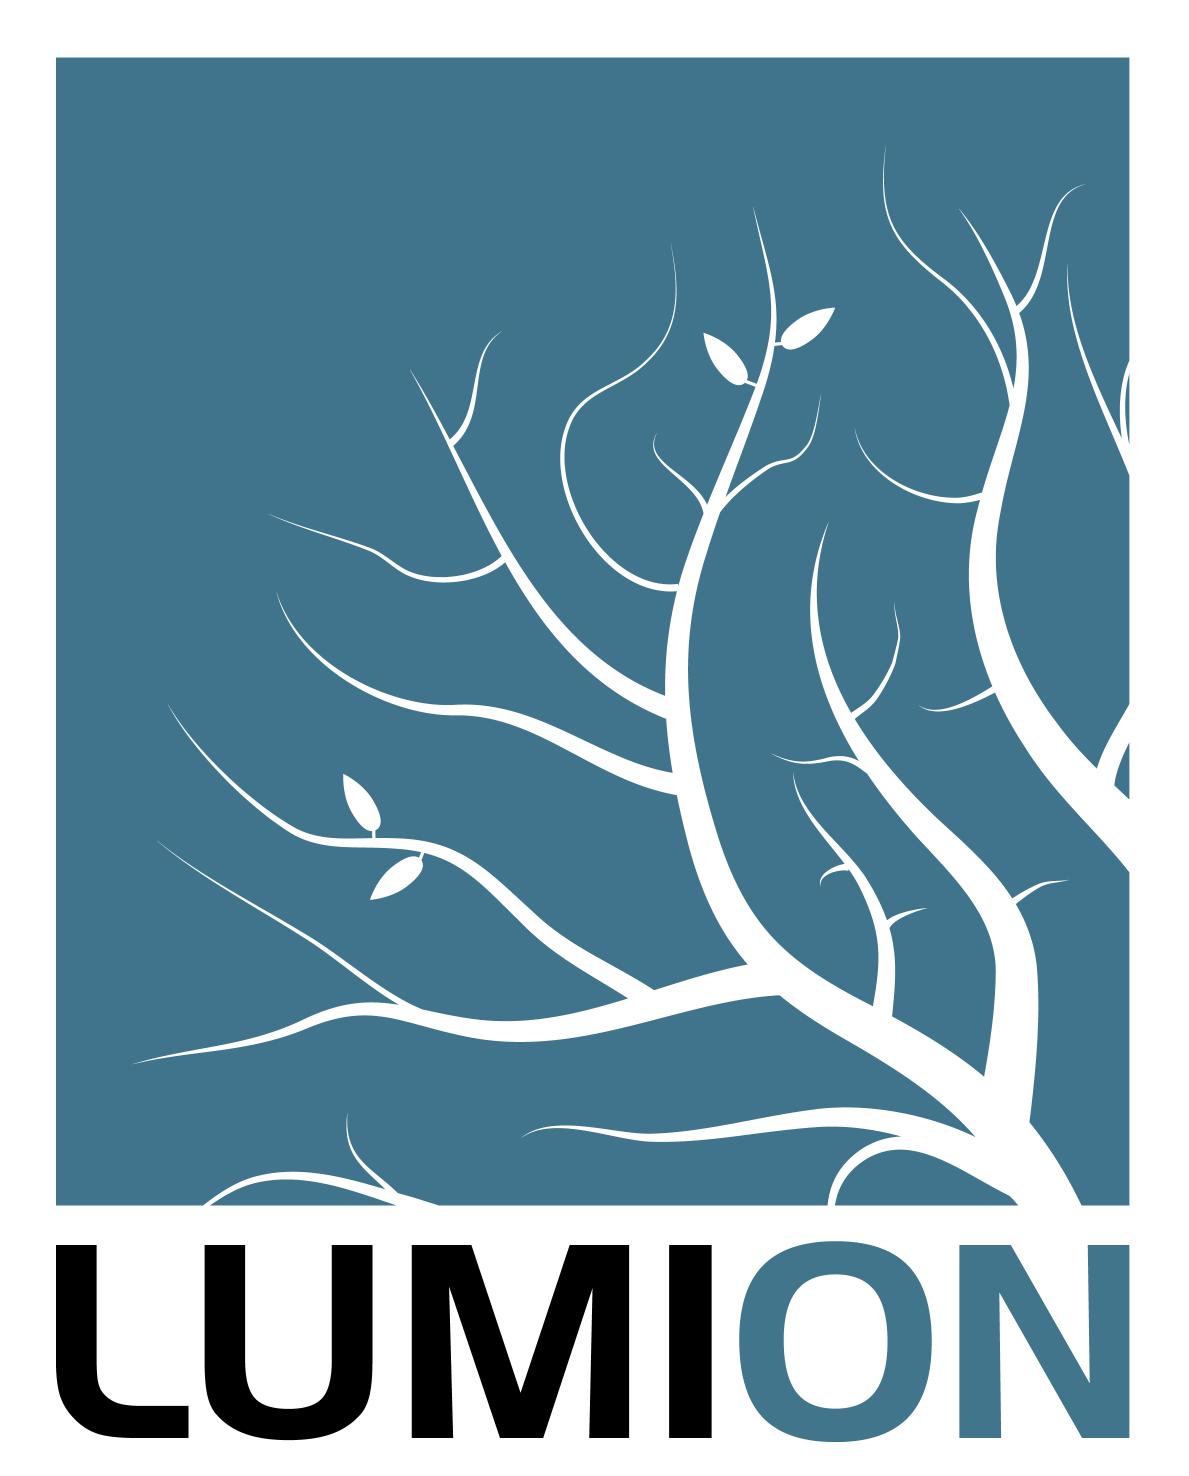 766Lumion_Logo_2016_TwoColors_On_White